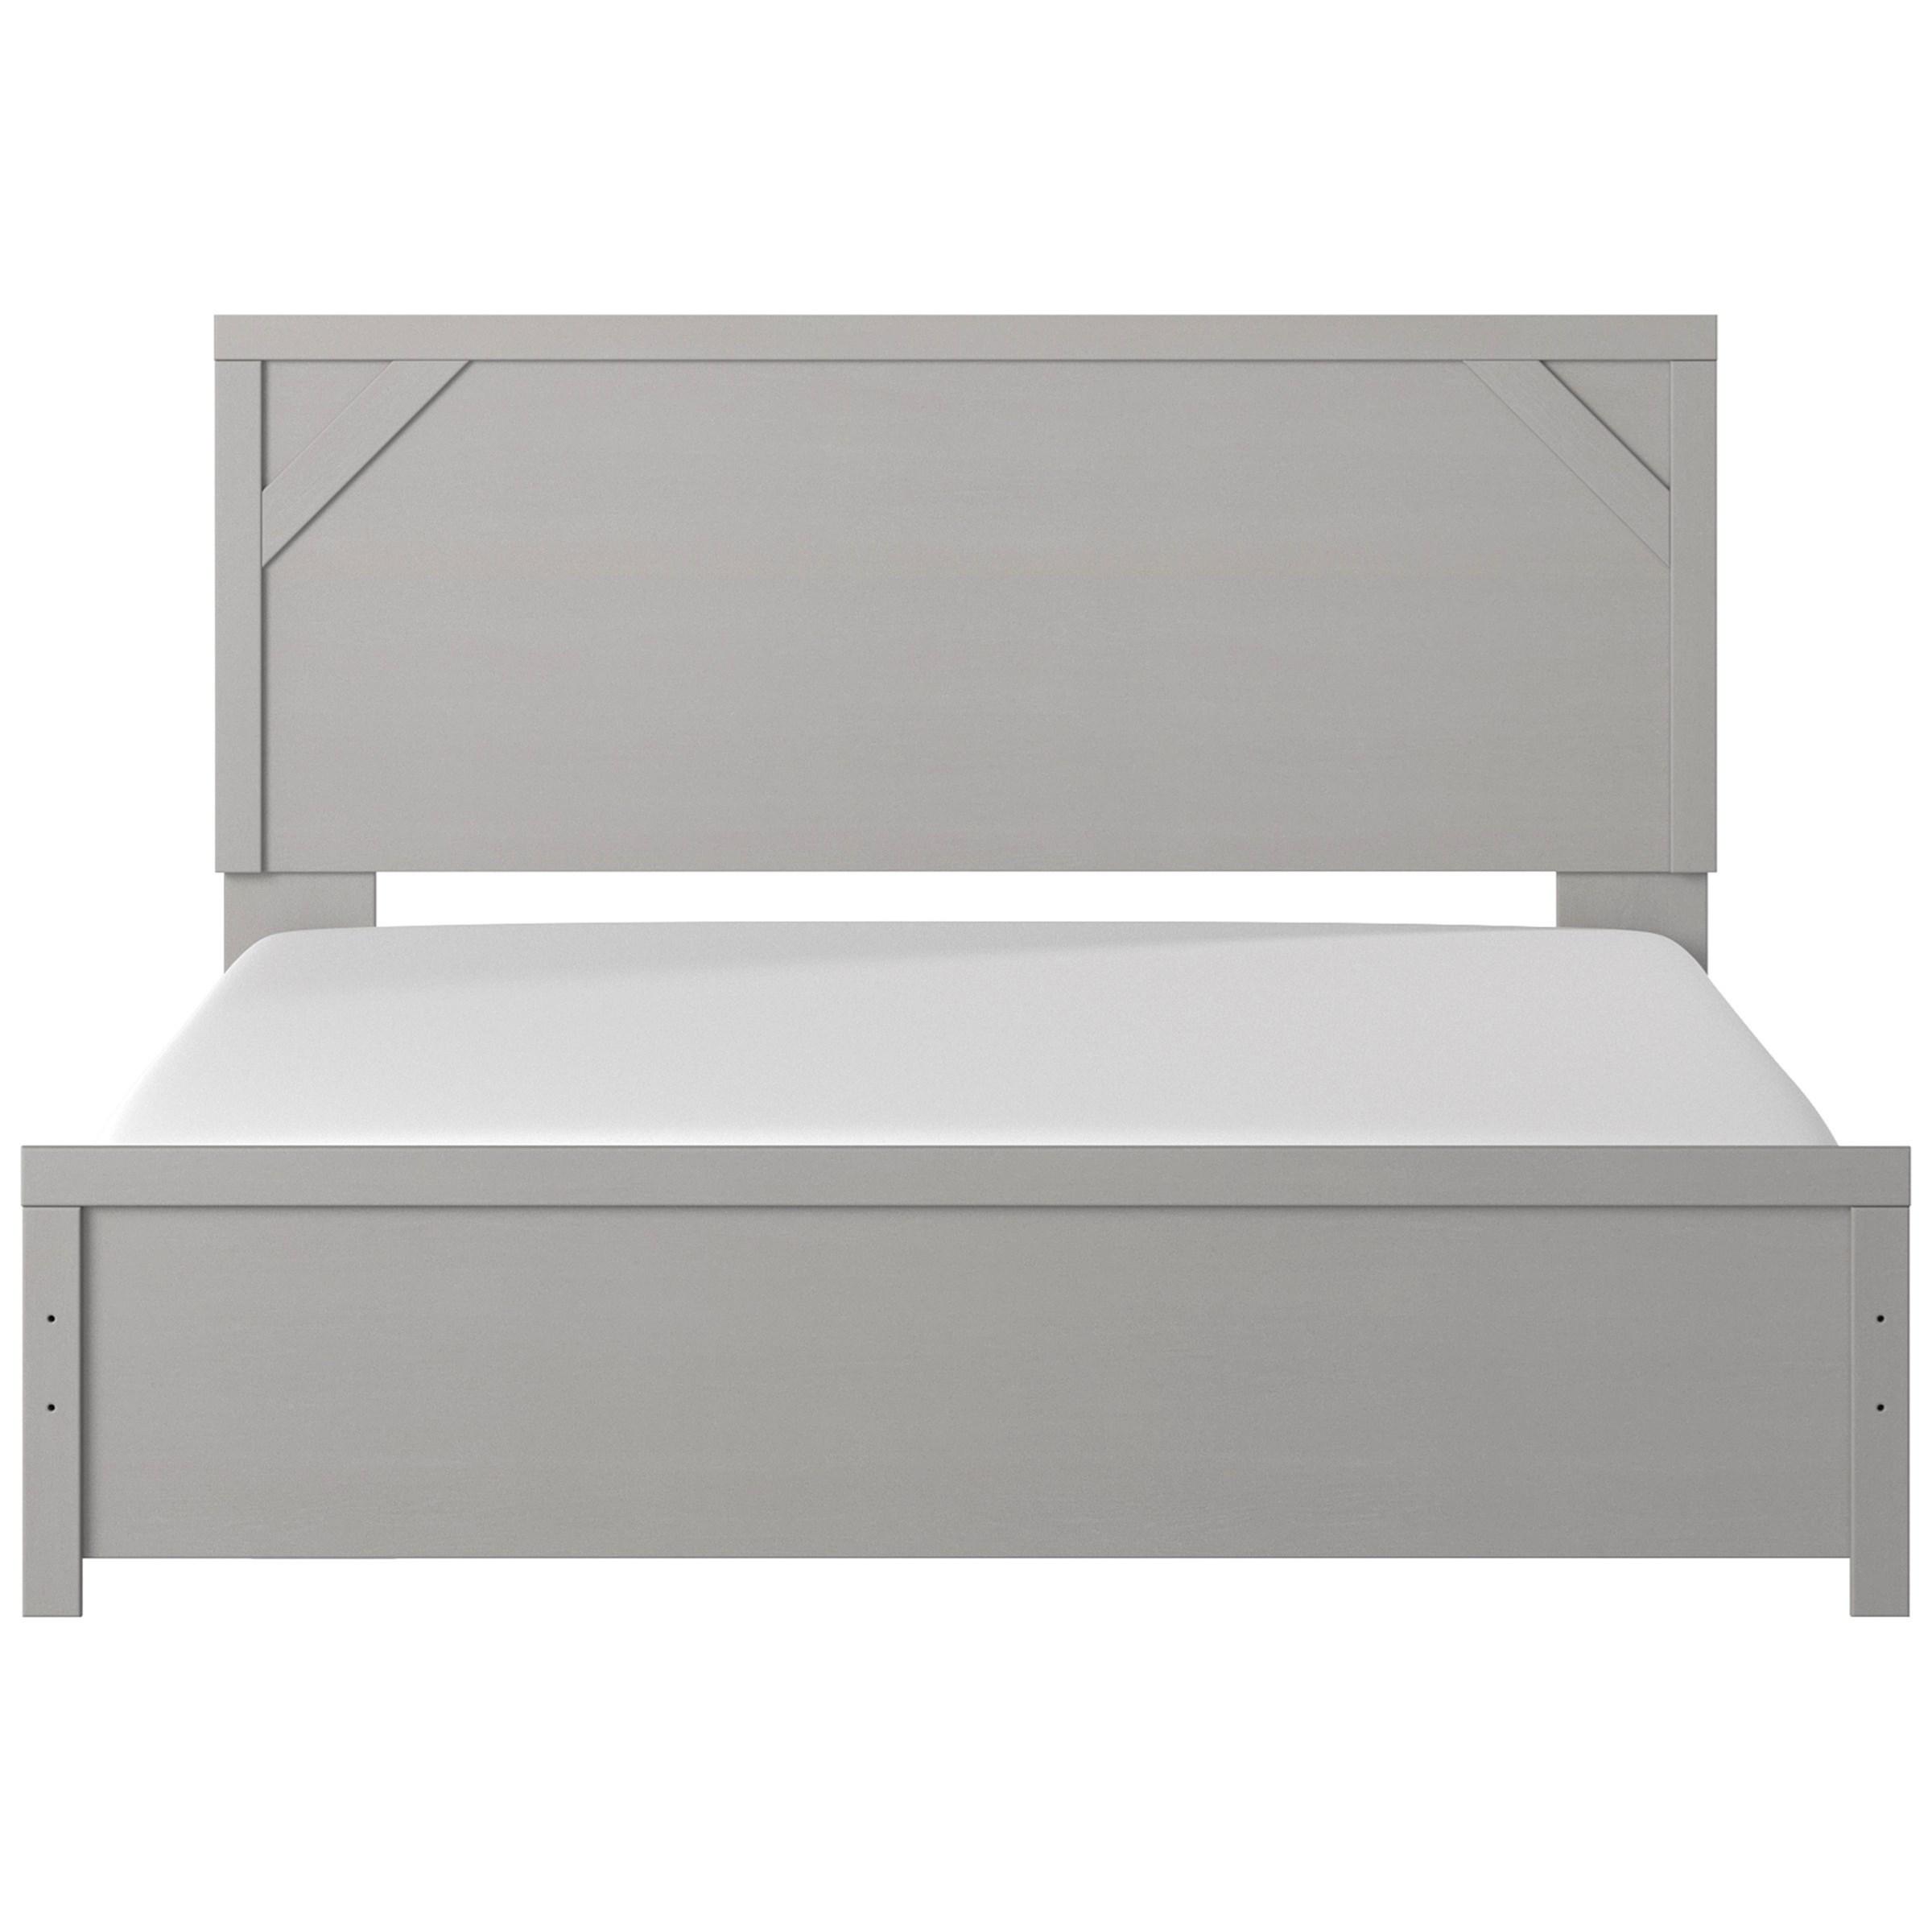 Cottenburg King Panel Bed by Ashley (Signature Design) at Johnny Janosik